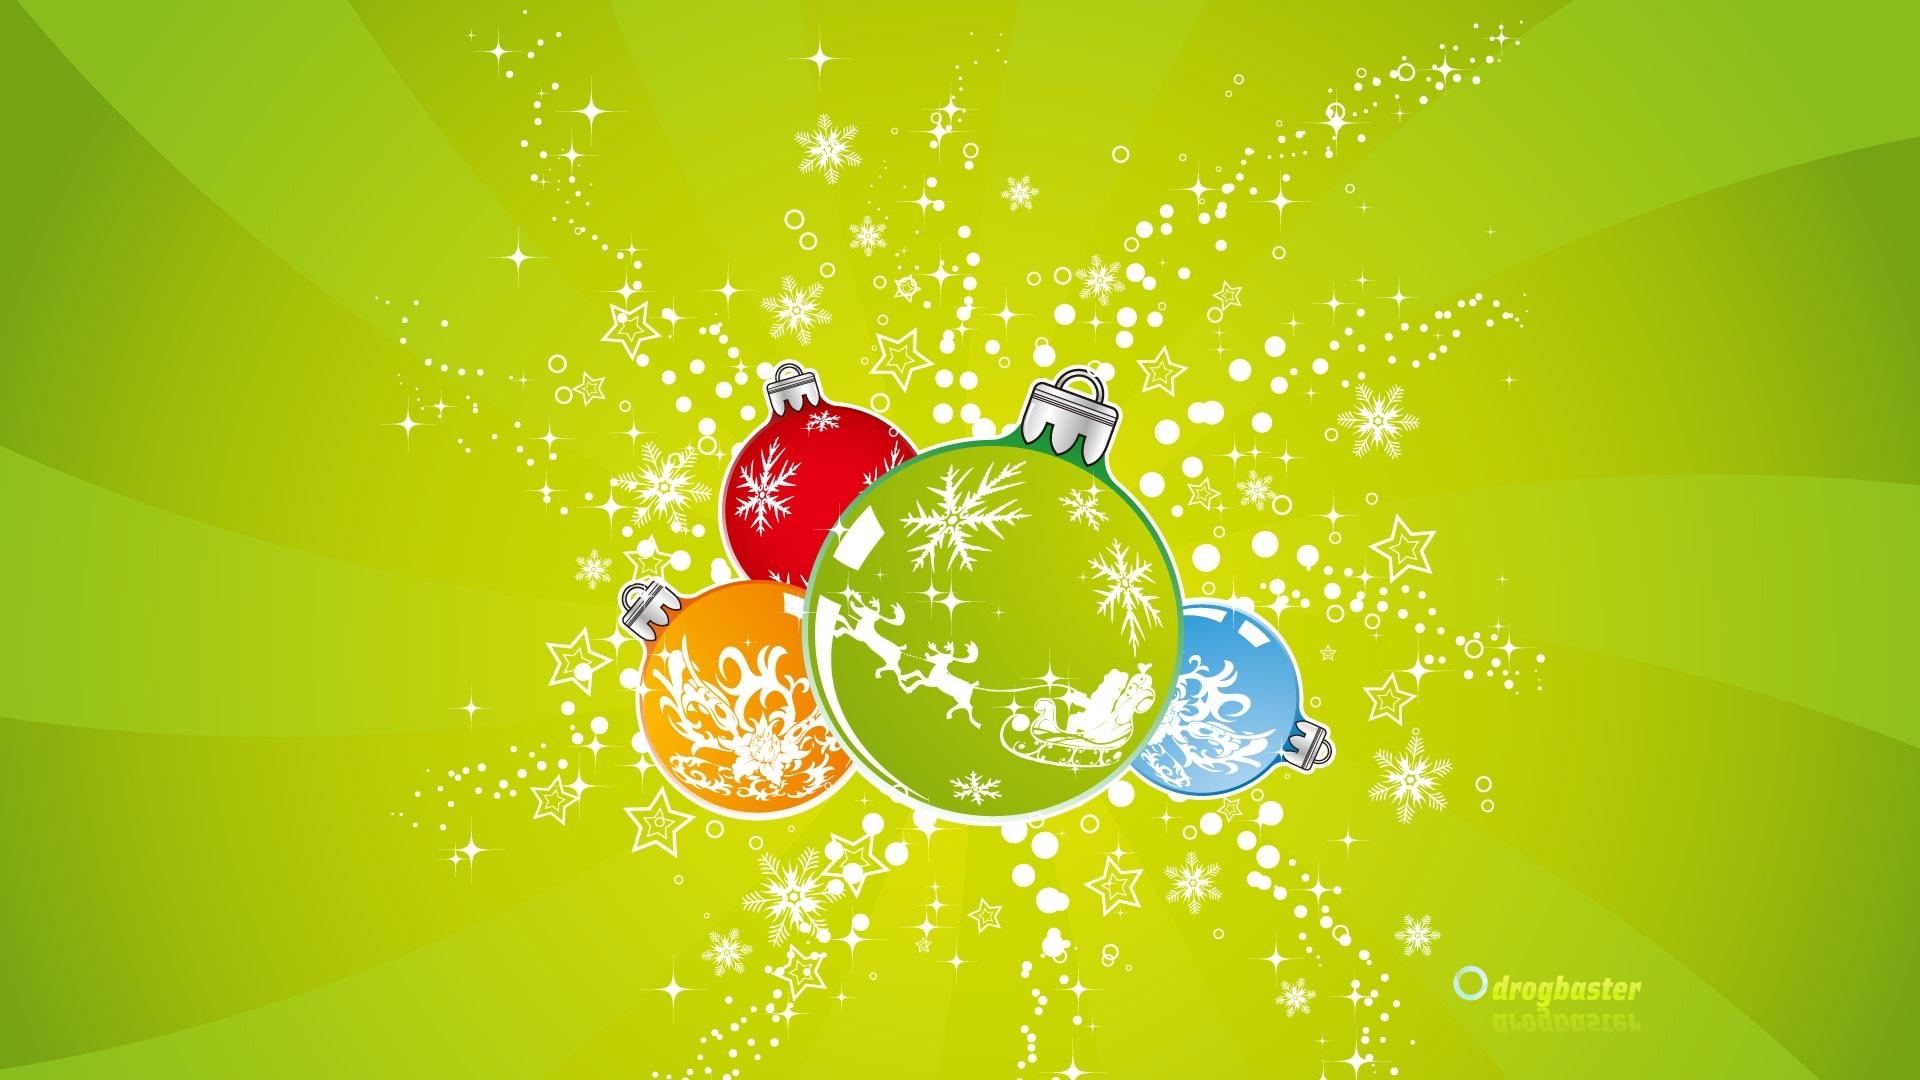 Sfondi Wallpapers tema natalizio, sfondi di natale gratis